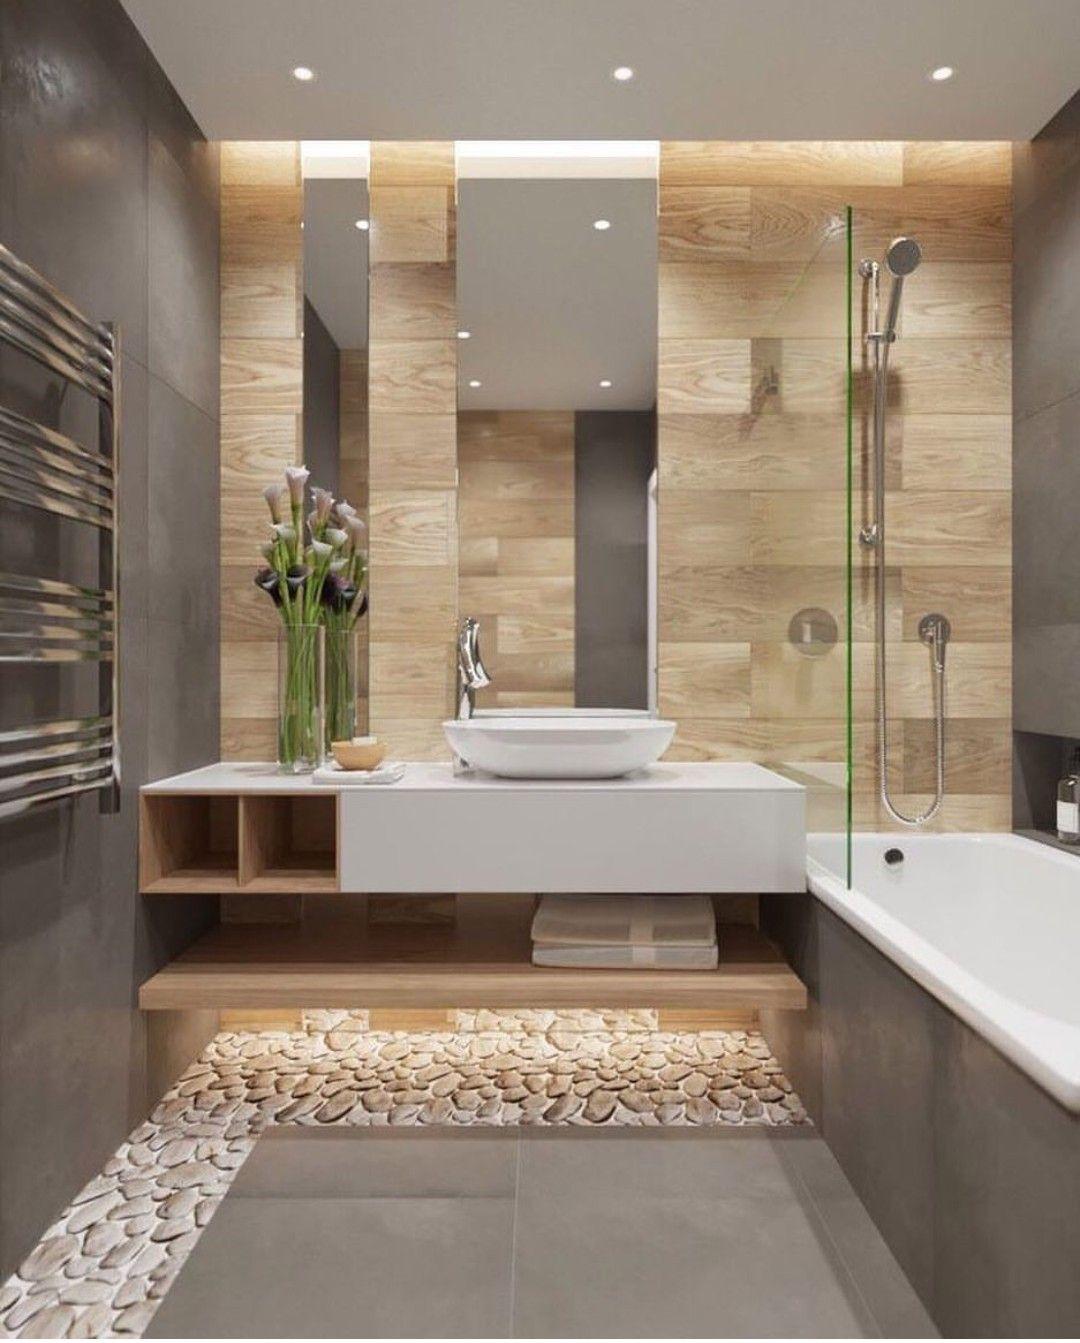 Pin By Toofy On Bathroom In 2020 Luxury Bathroom Master Baths Bathroom Interior Bathrooms Remodel